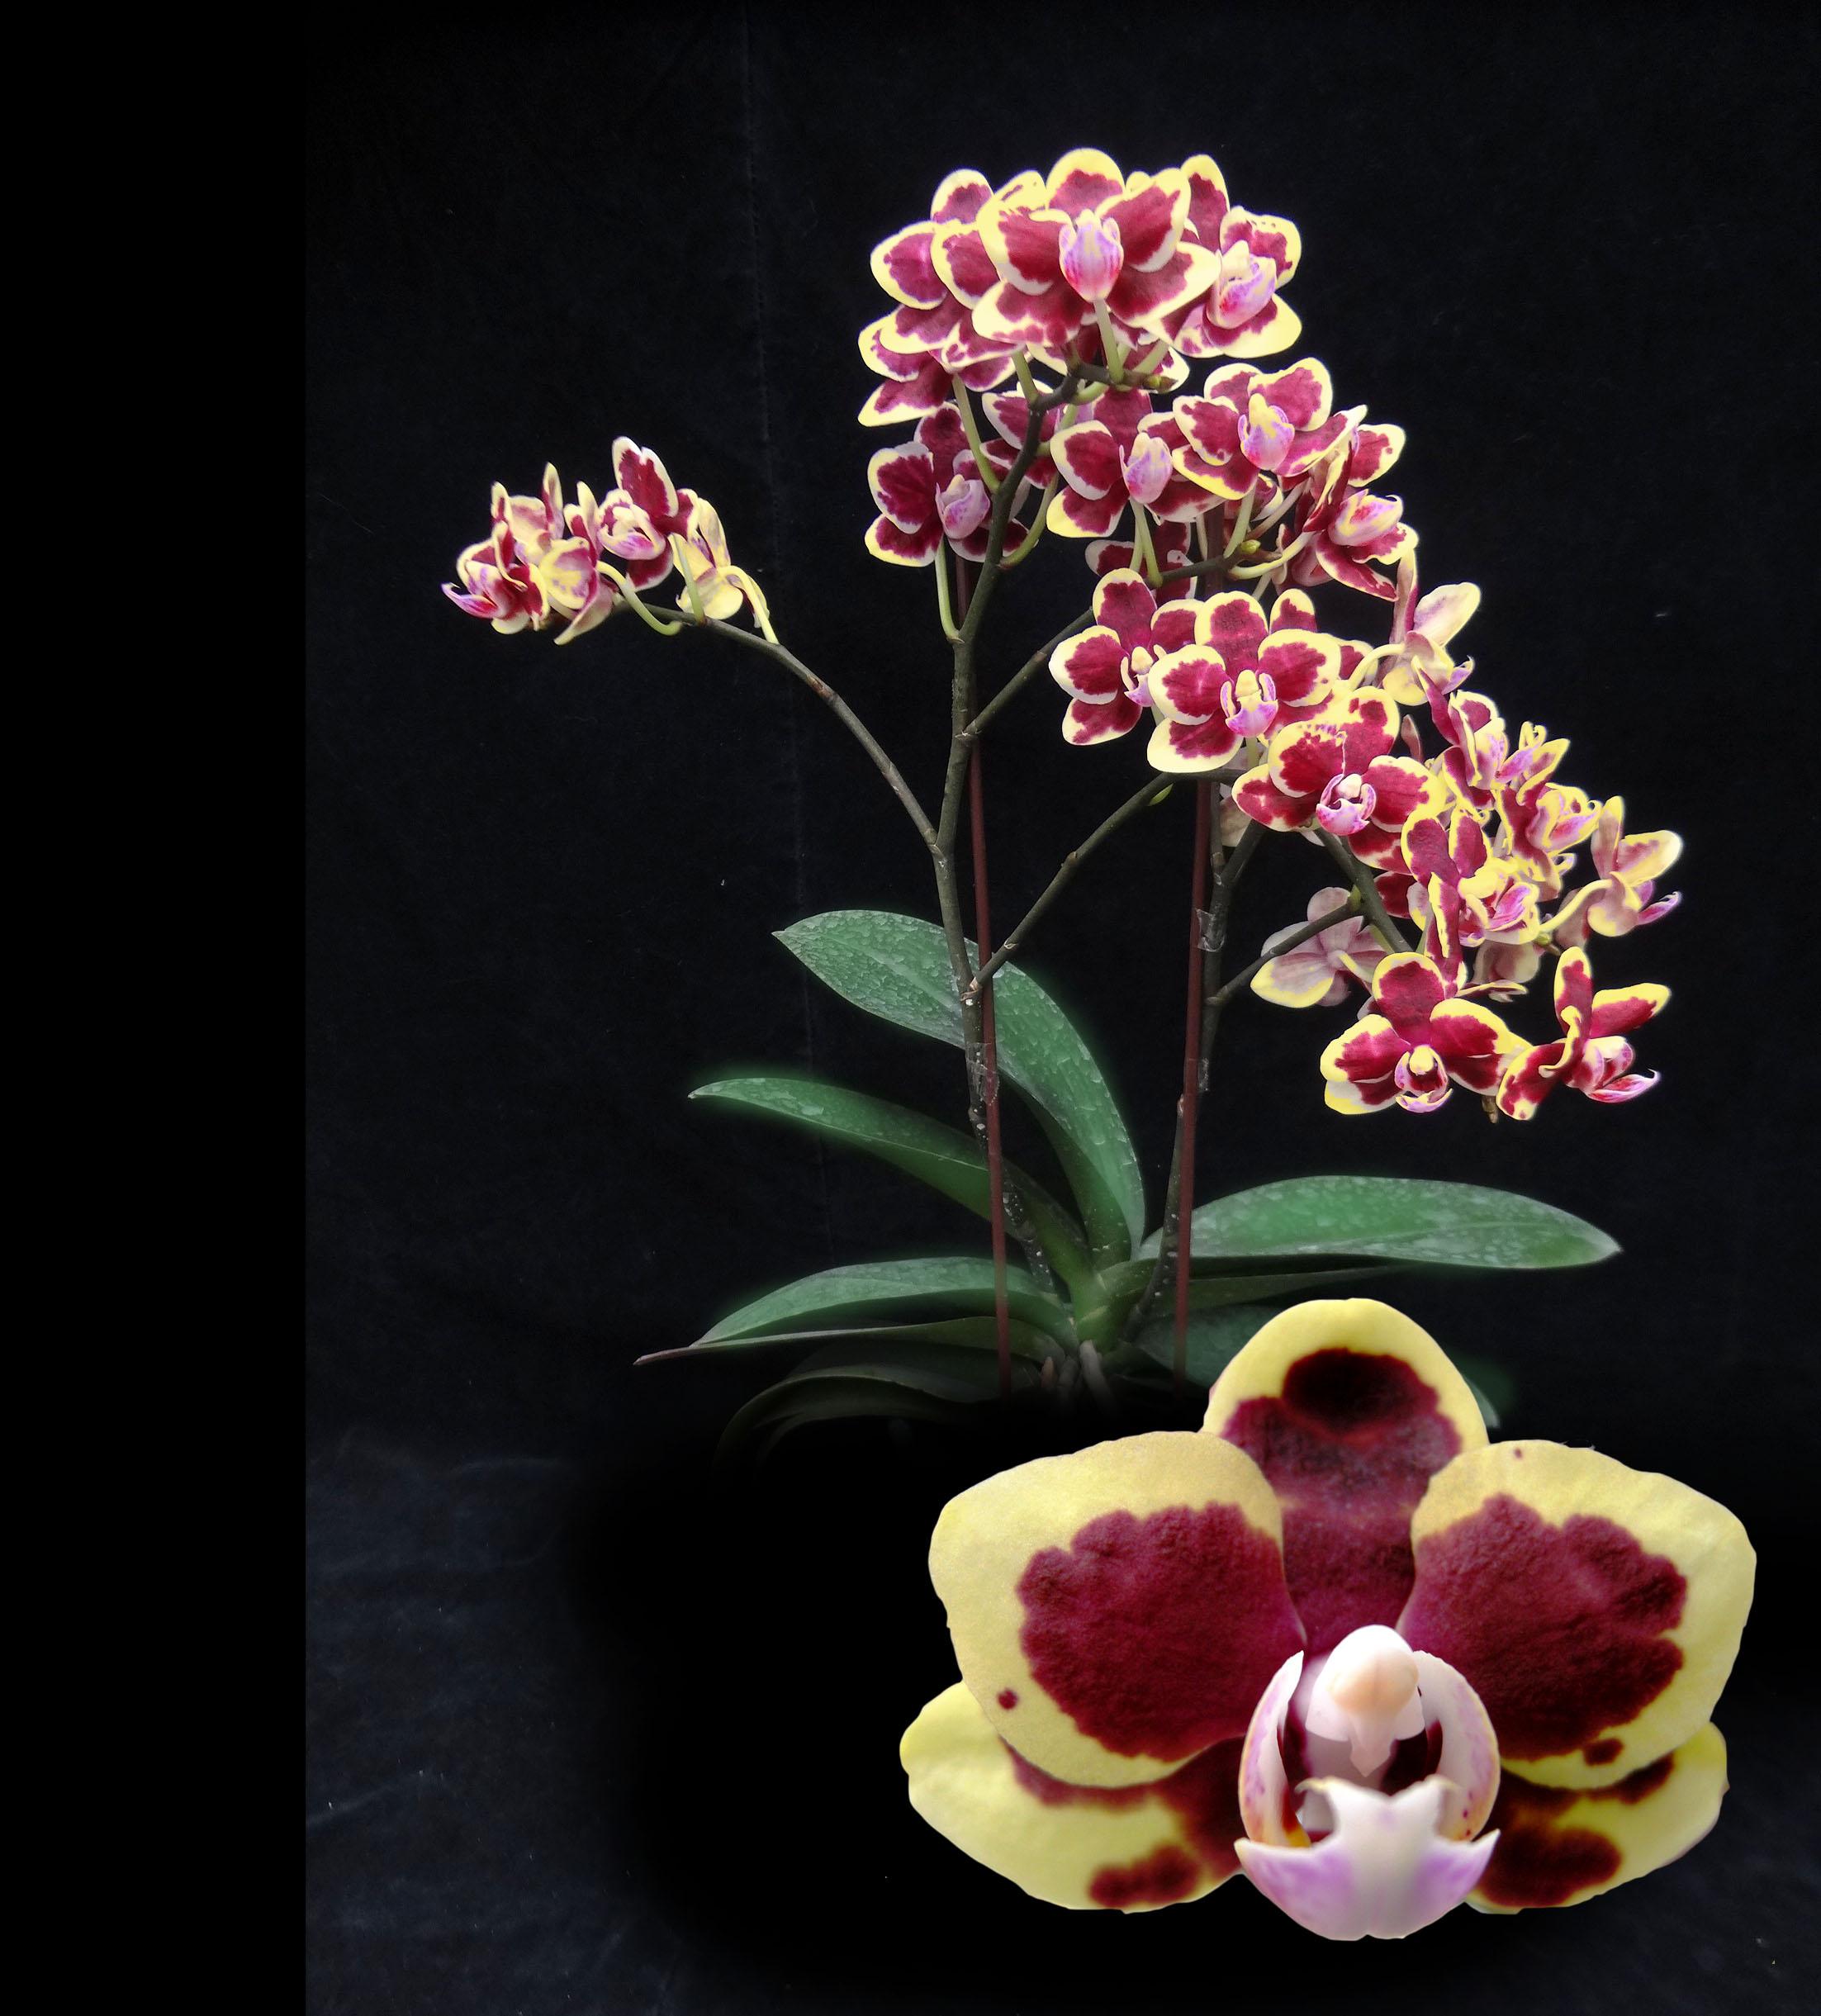 A07403-Dtps. Lioulin Sparrow Taida Violet Butterfly